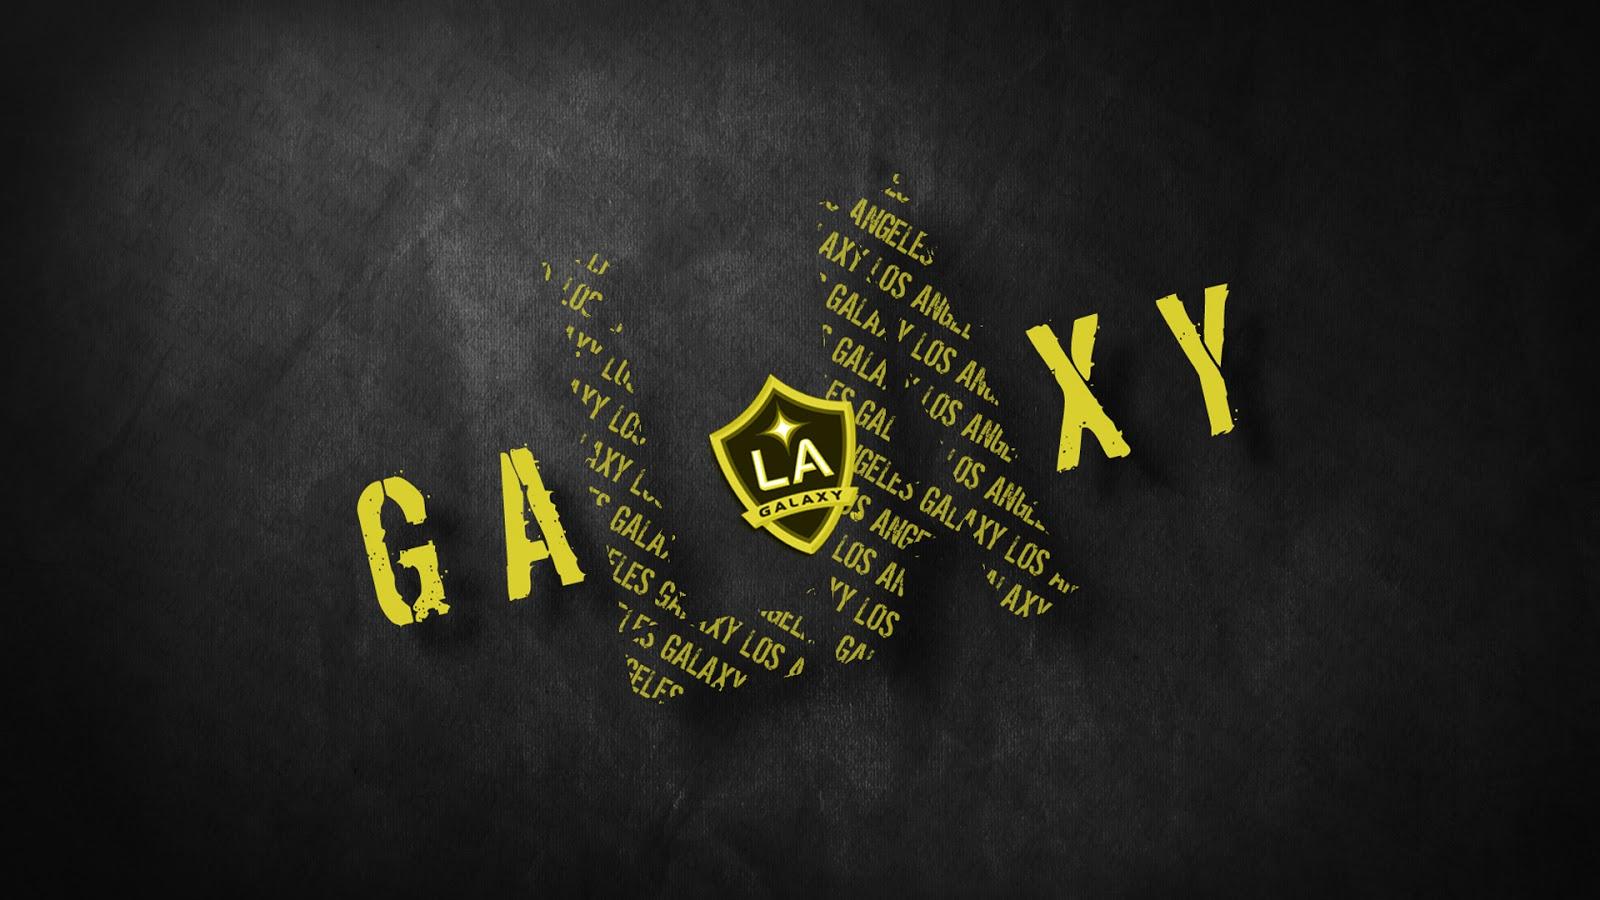 http://1.bp.blogspot.com/-r-w-kxeTQdI/UOTExsAYRsI/AAAAAAAAOGM/6EWvX4N-6OU/s1600/LA+Galaxy+2013+Wallpapers+HD+Logo+2.jpg